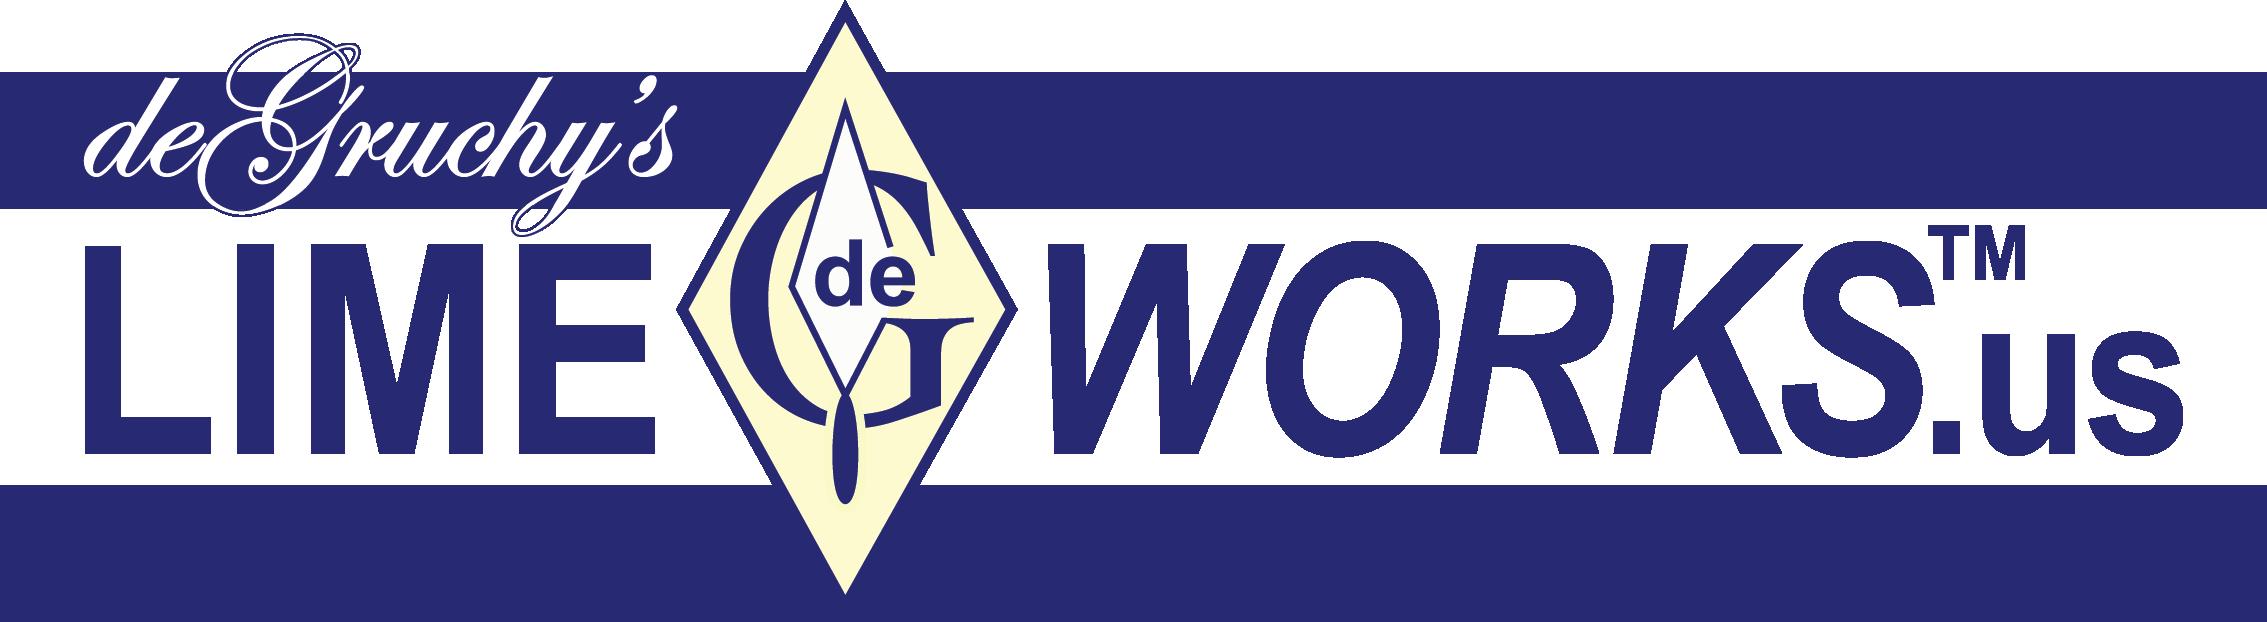 LimeWorks.us Logo